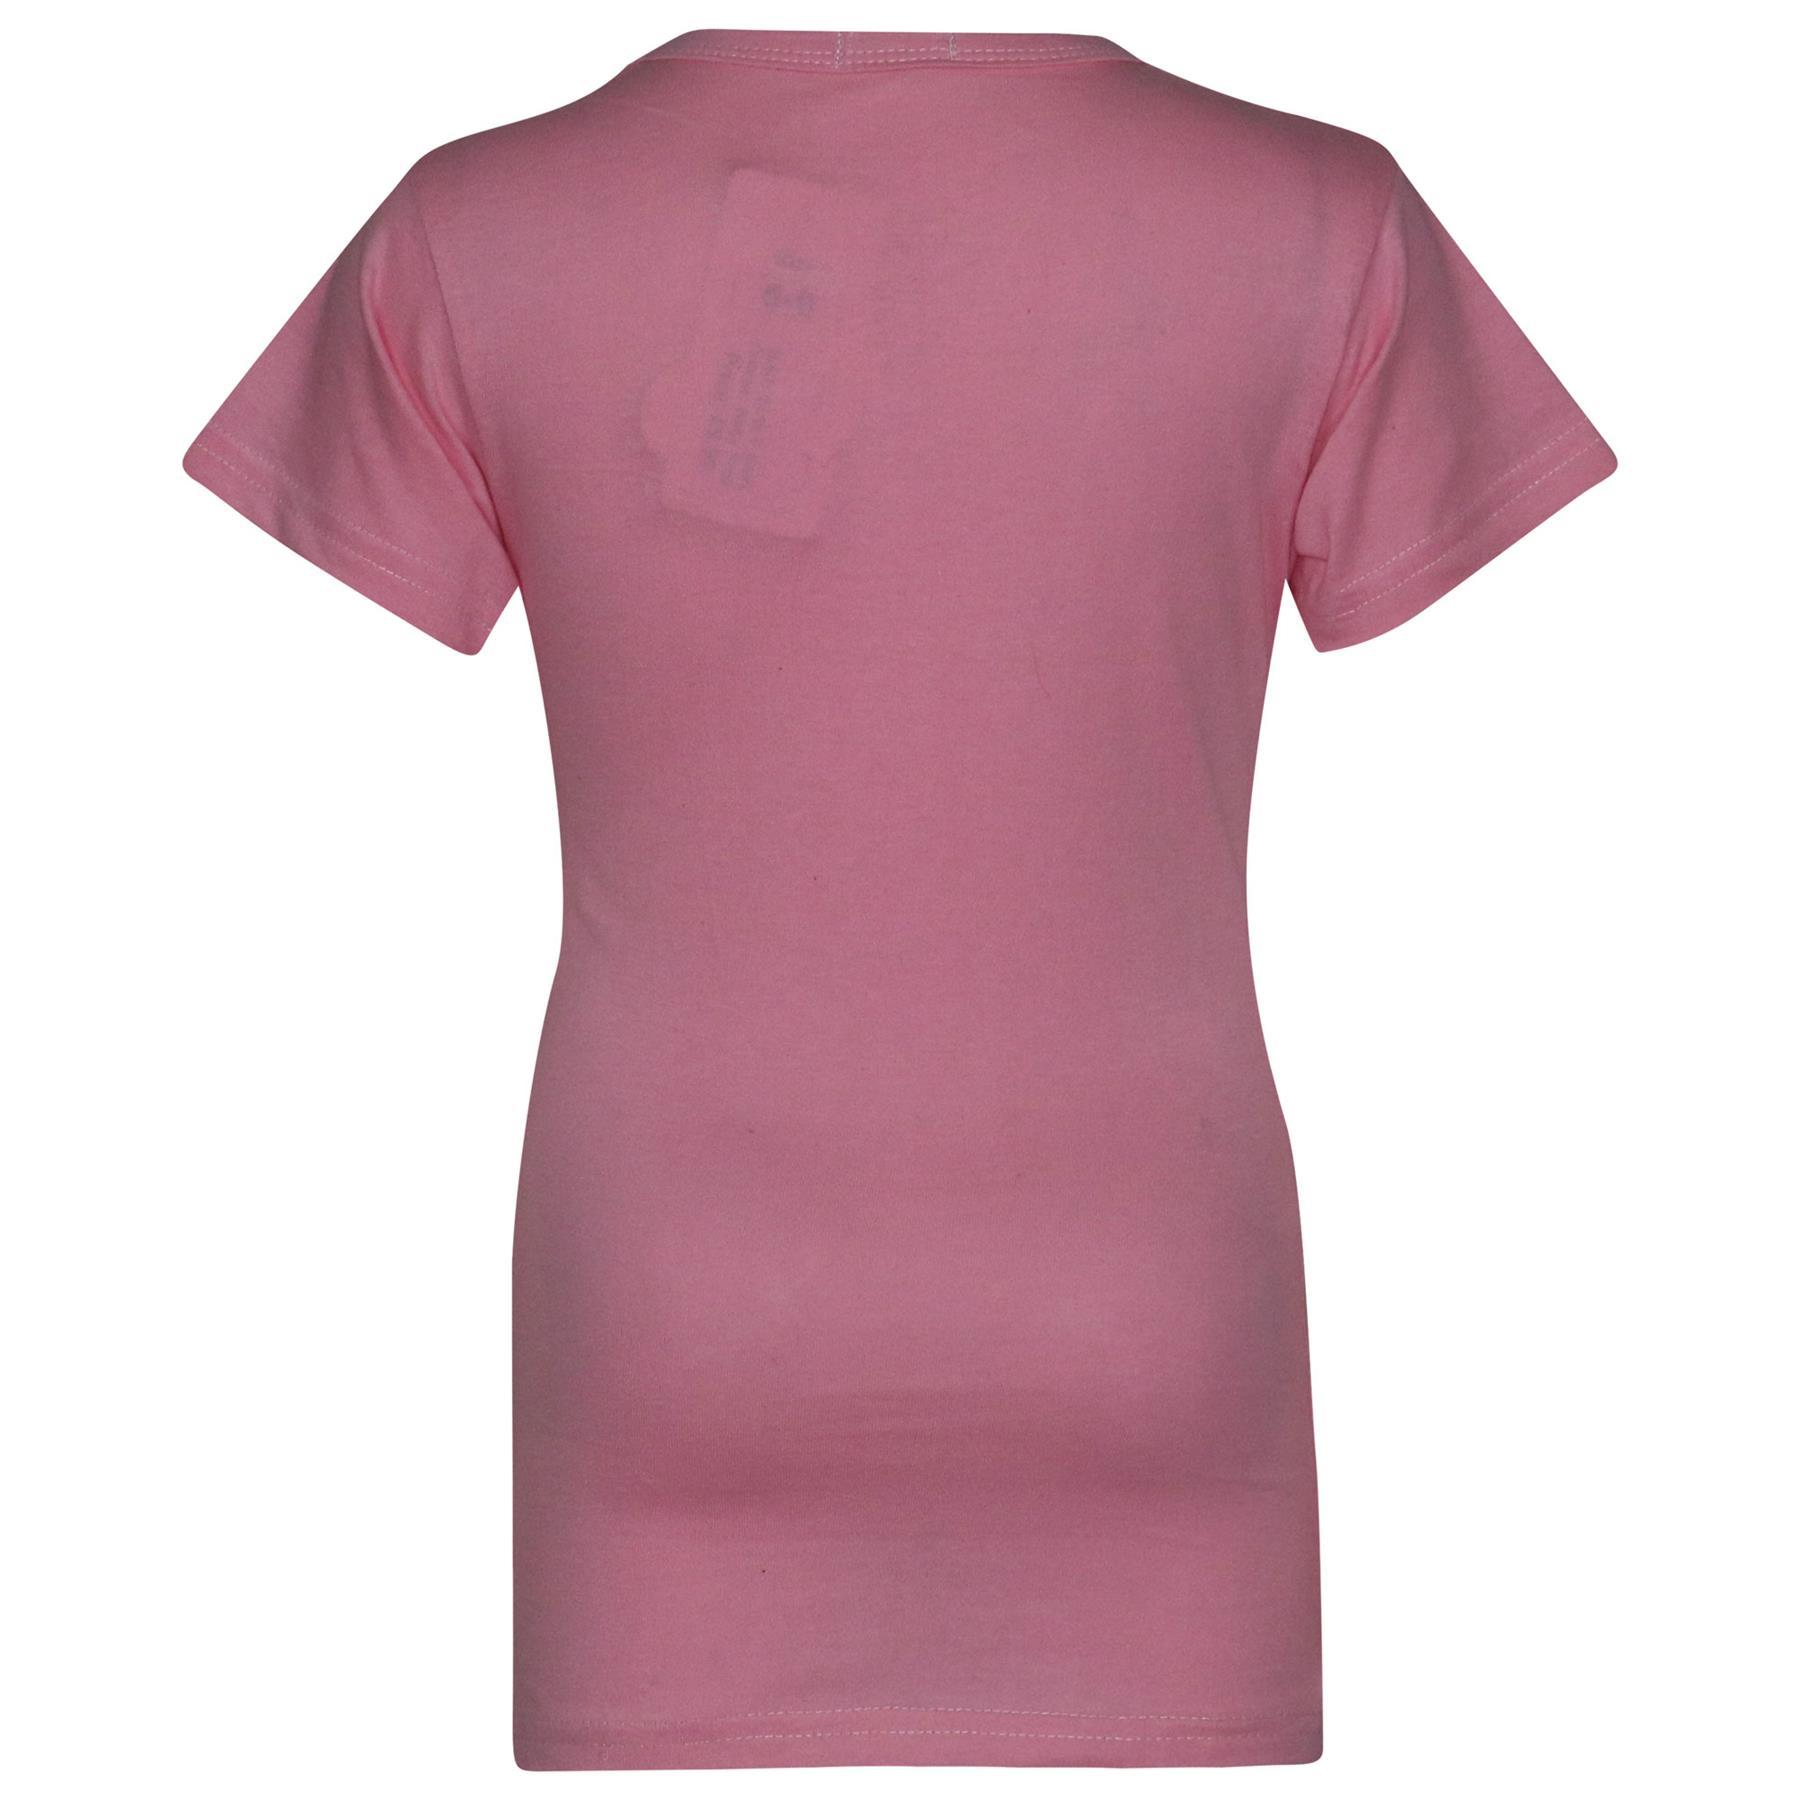 Kids-Girls-T-Shirts-Designer-100-Cotton-Plain-School-T-Shirt-Top-New-Age-3-13Yr thumbnail 6